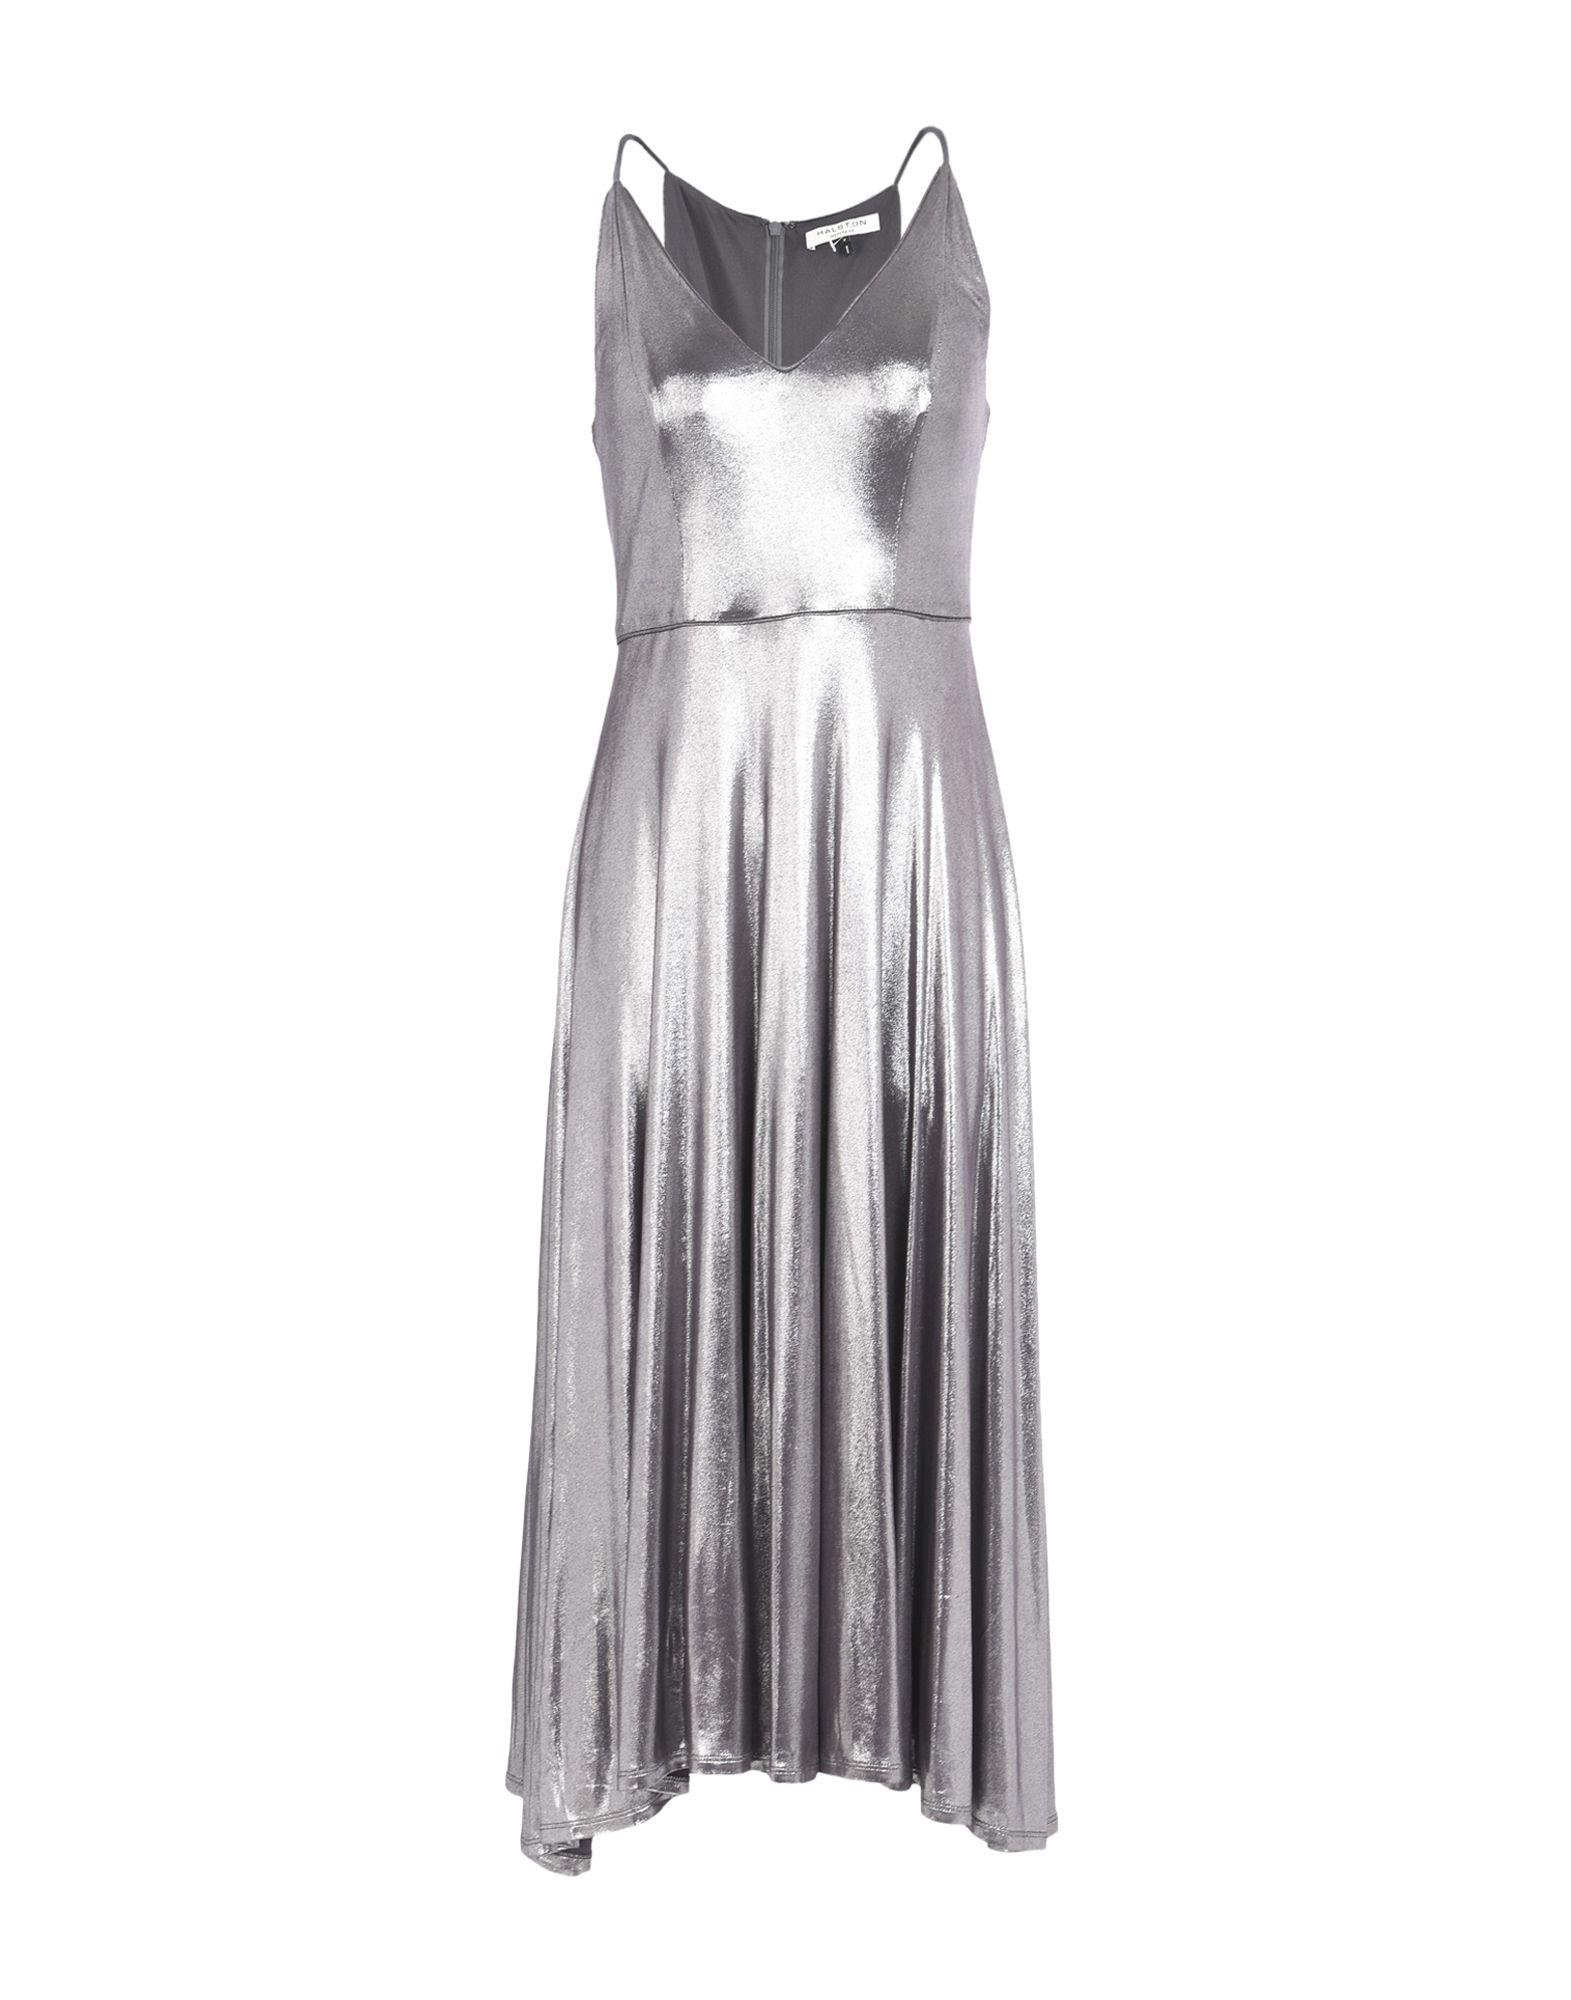 HALSTON HERITAGE Платье длиной 3/4 lisa corti платье длиной 3 4